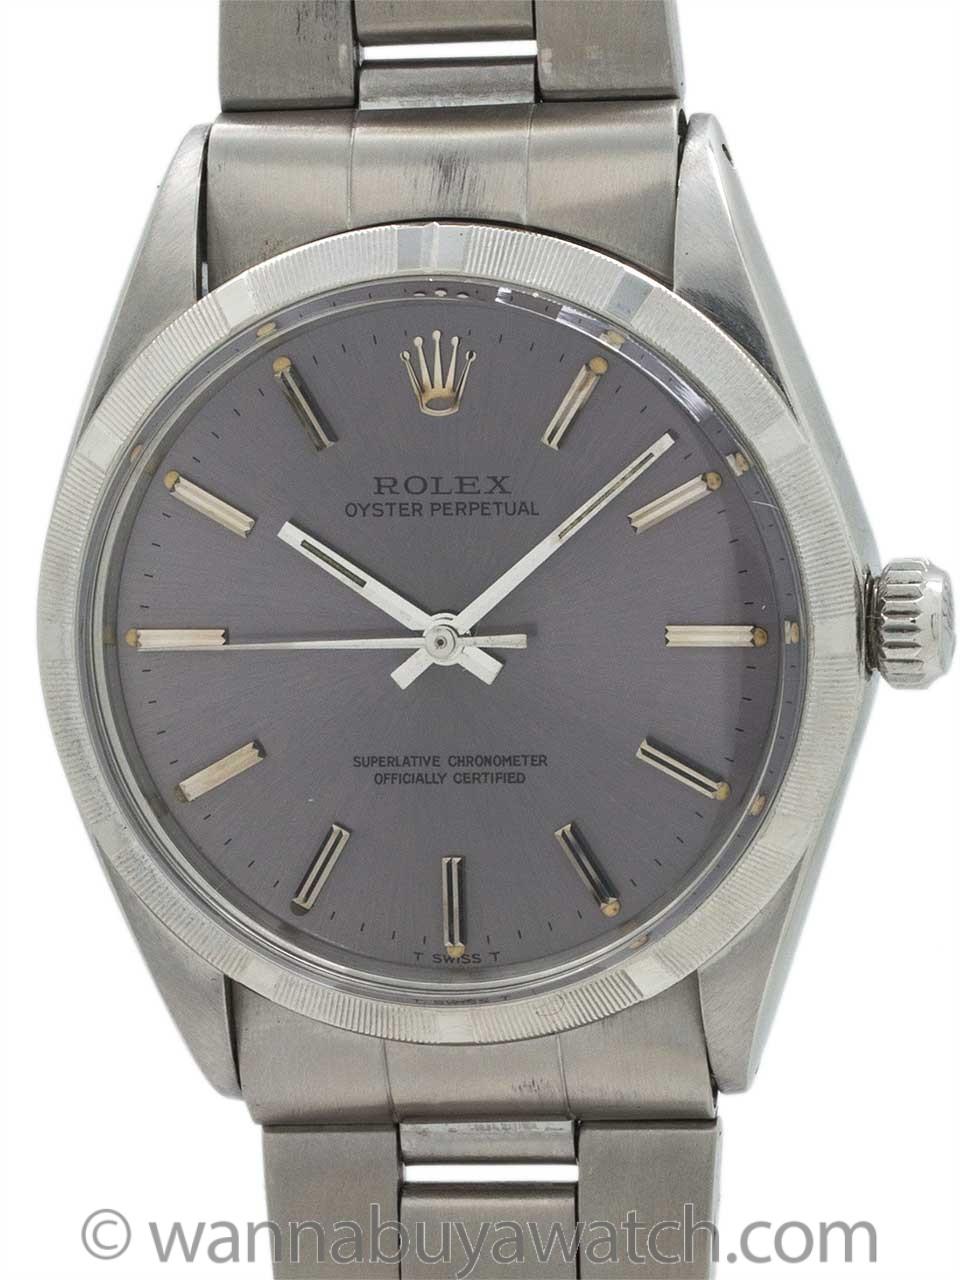 Rolex Oyster Perpetual ref 1002 Gray Purple Dial circa 1969